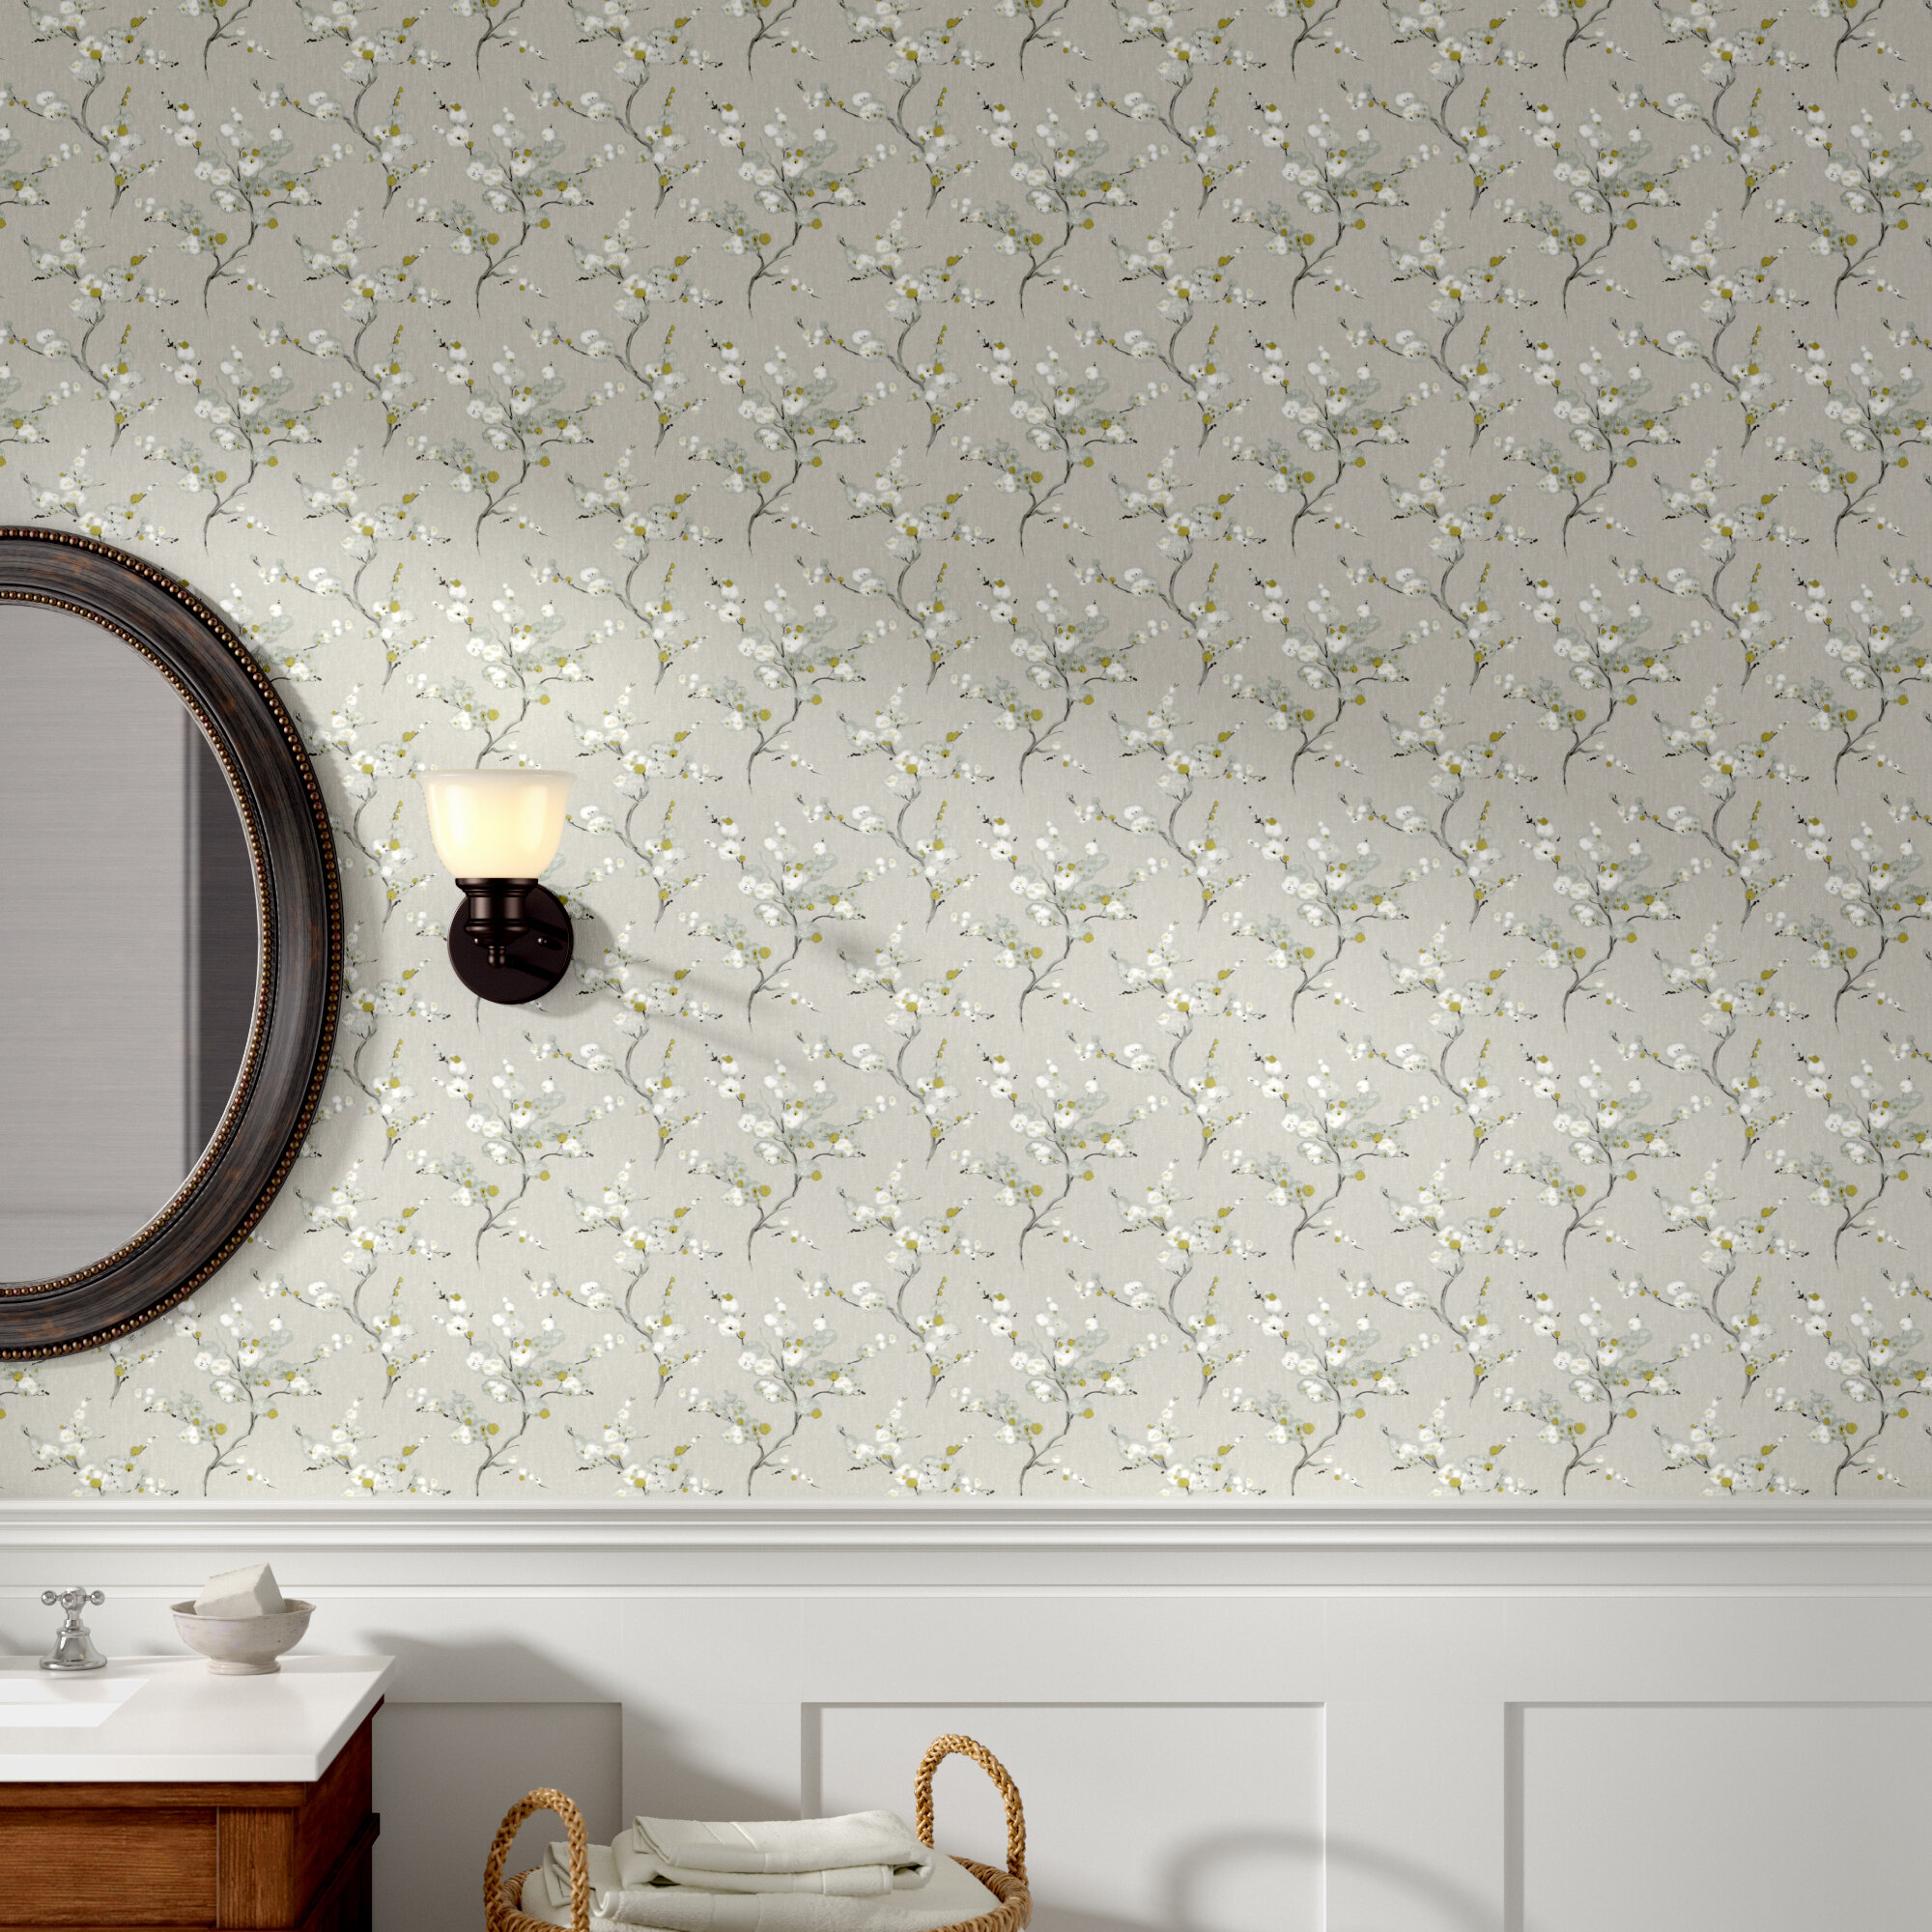 Charlton Home Crediton 18 L X 20 5 W Texture Peel And Stick Wallpaper Roll Reviews Wayfair